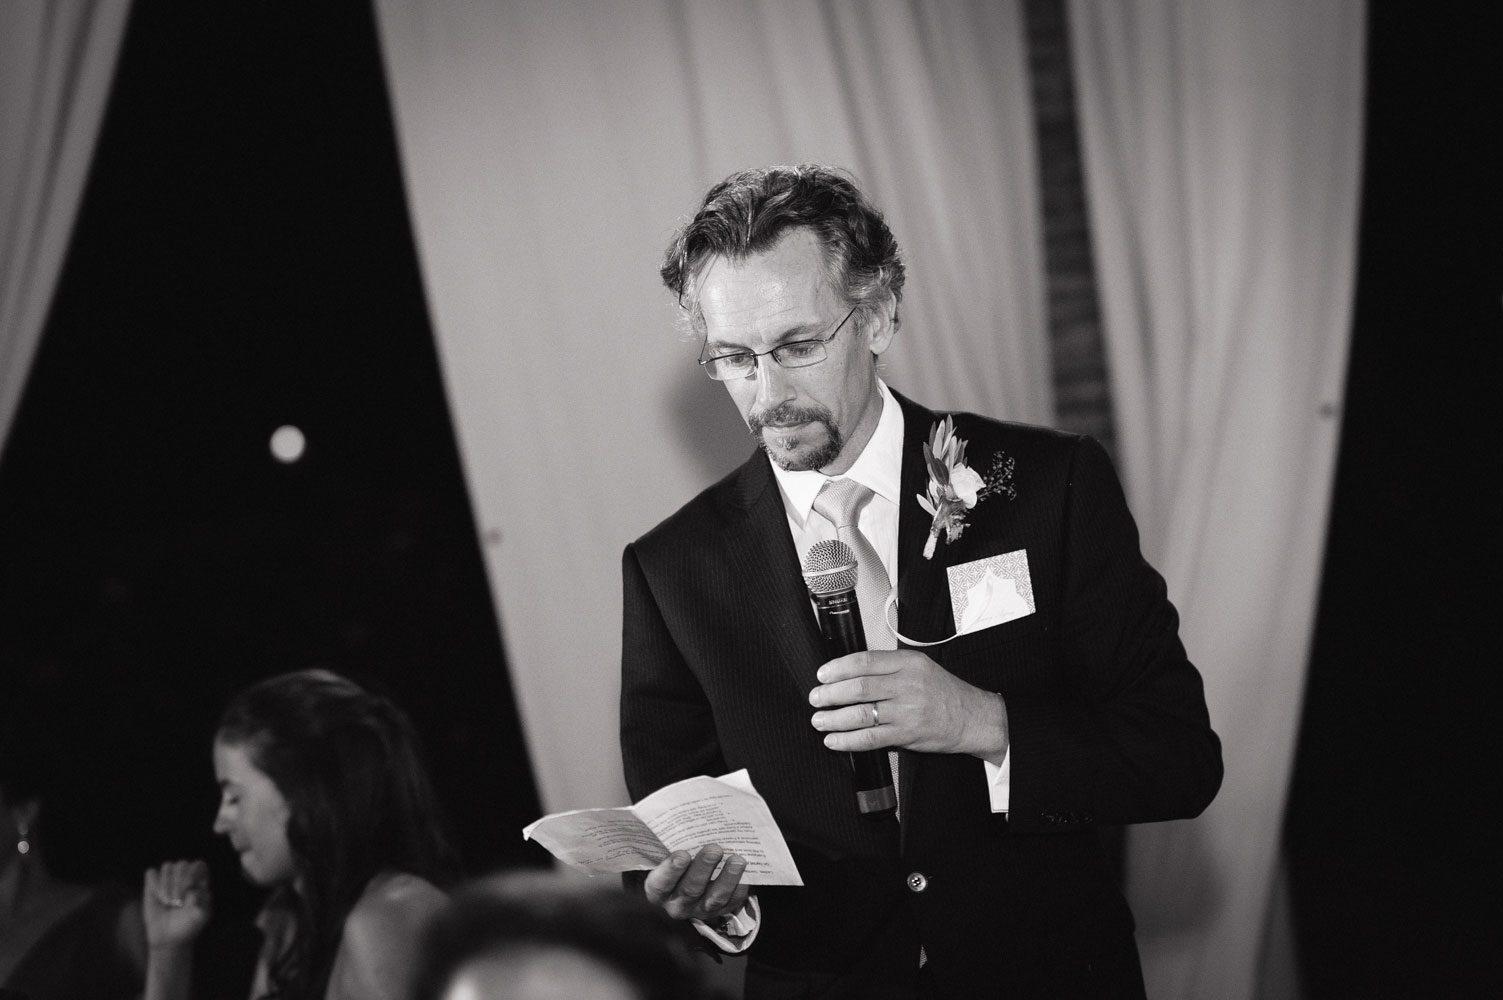 brother makes sincere wedding speech